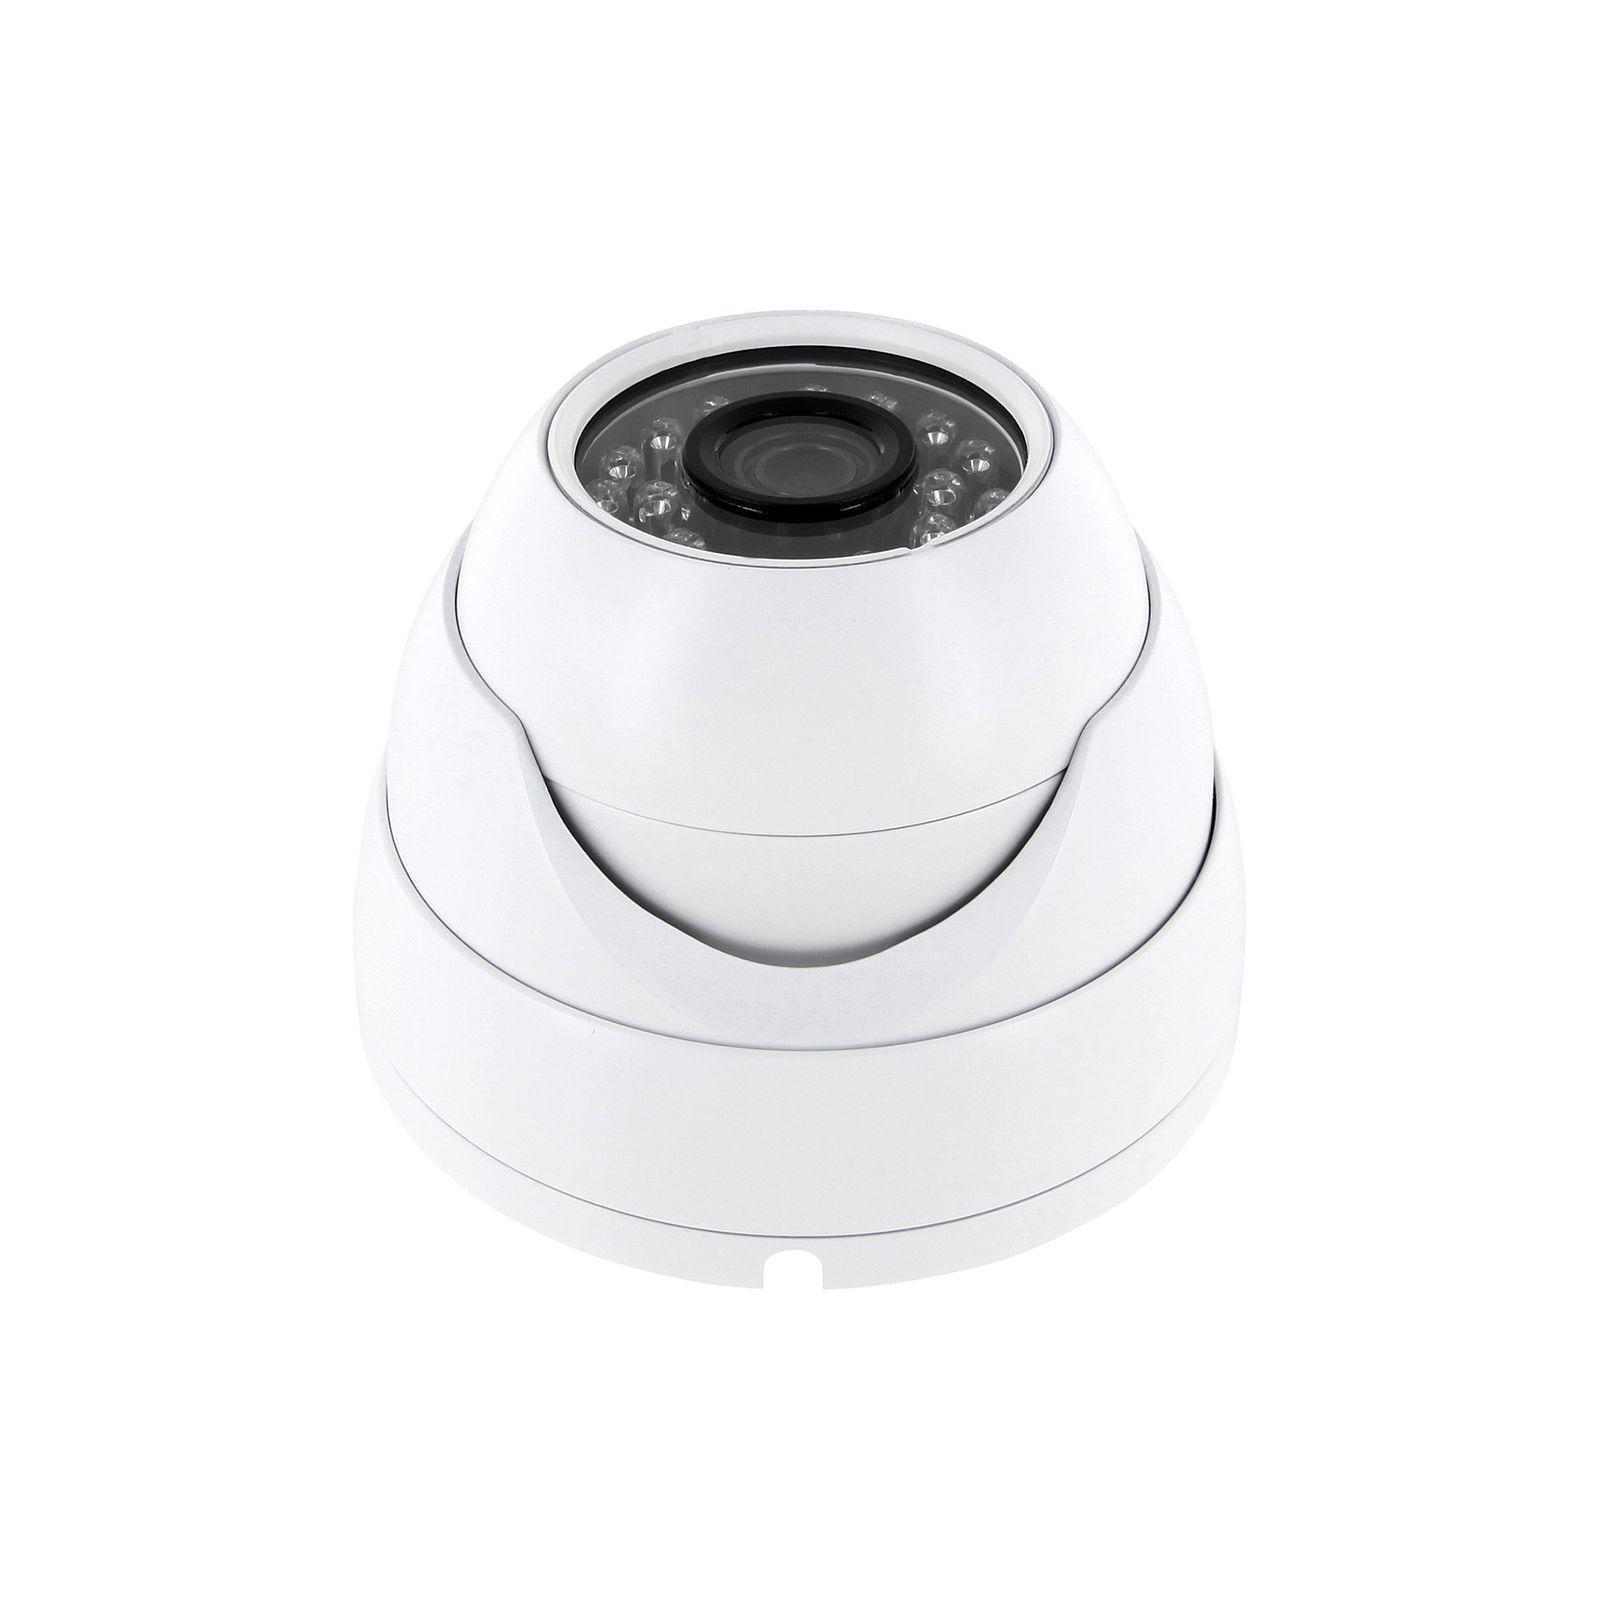 AHD Überwachungskamera Kompakt weiss PAL 1080p 25fps